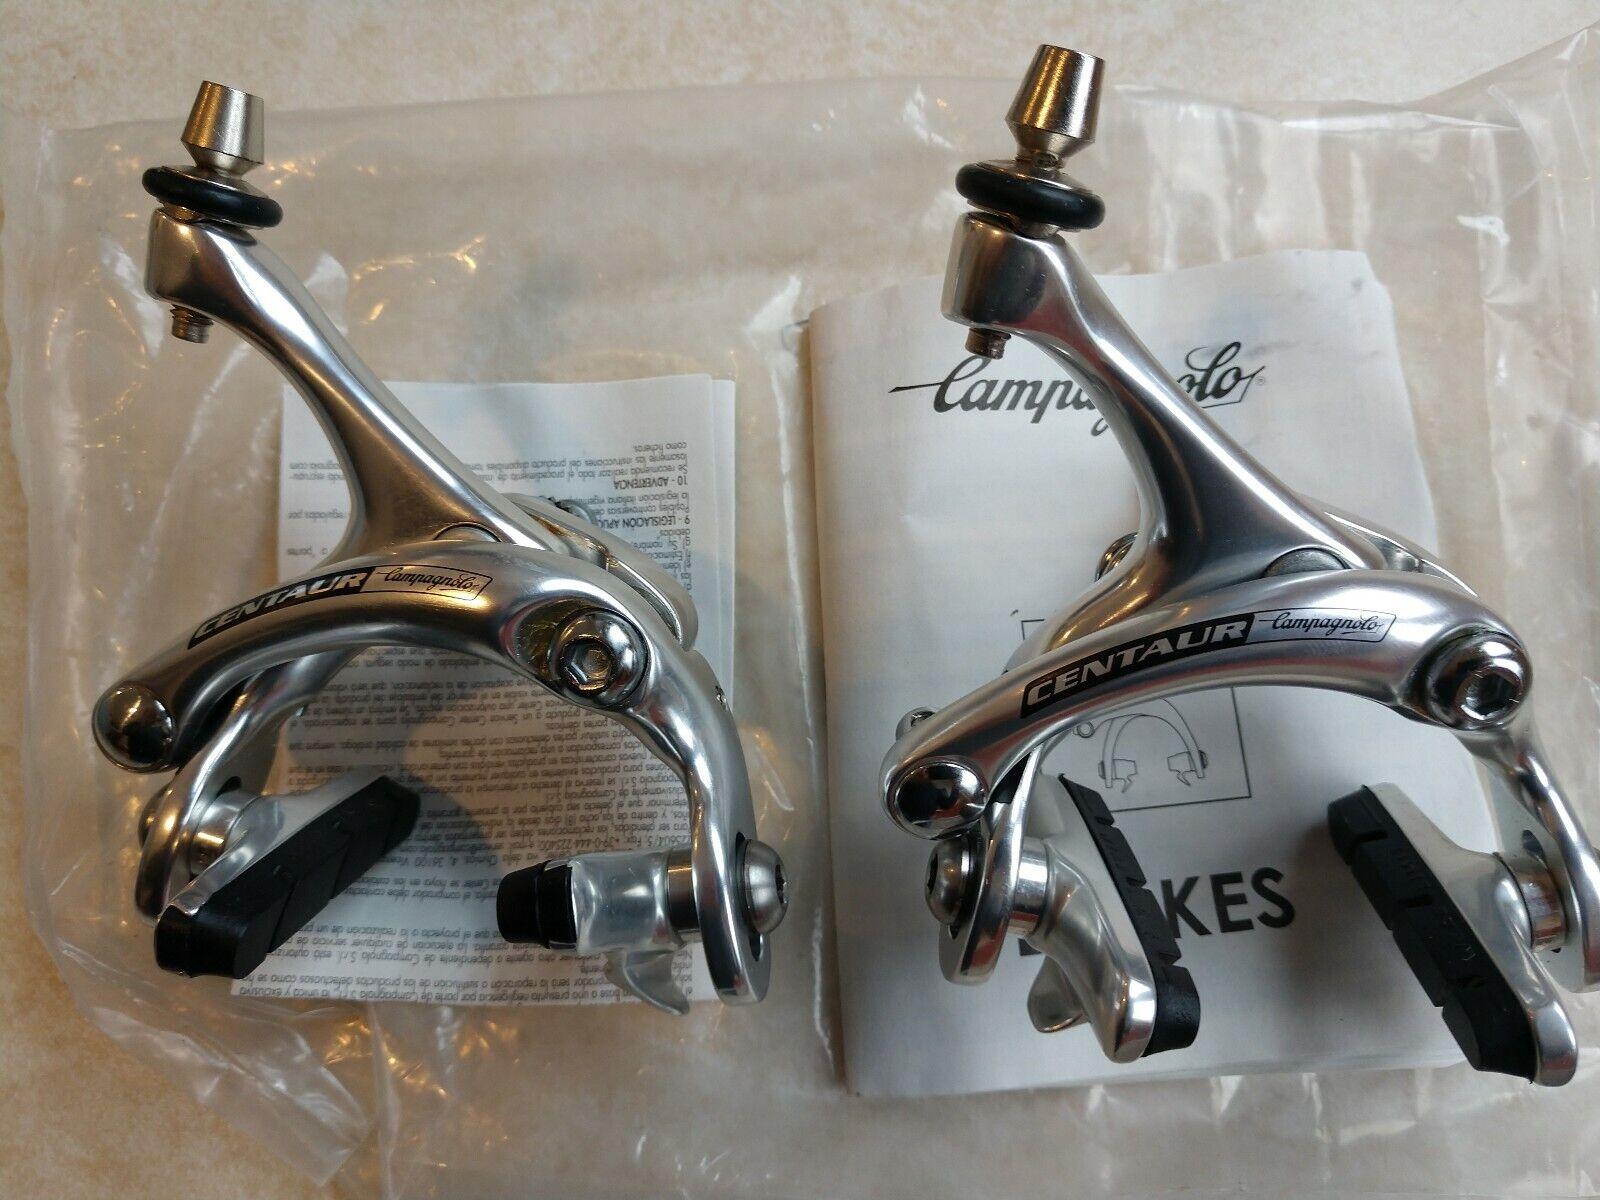 Vintage Campagnolo Centaur Dual Pivot Road Fahrrad Brakes Silber